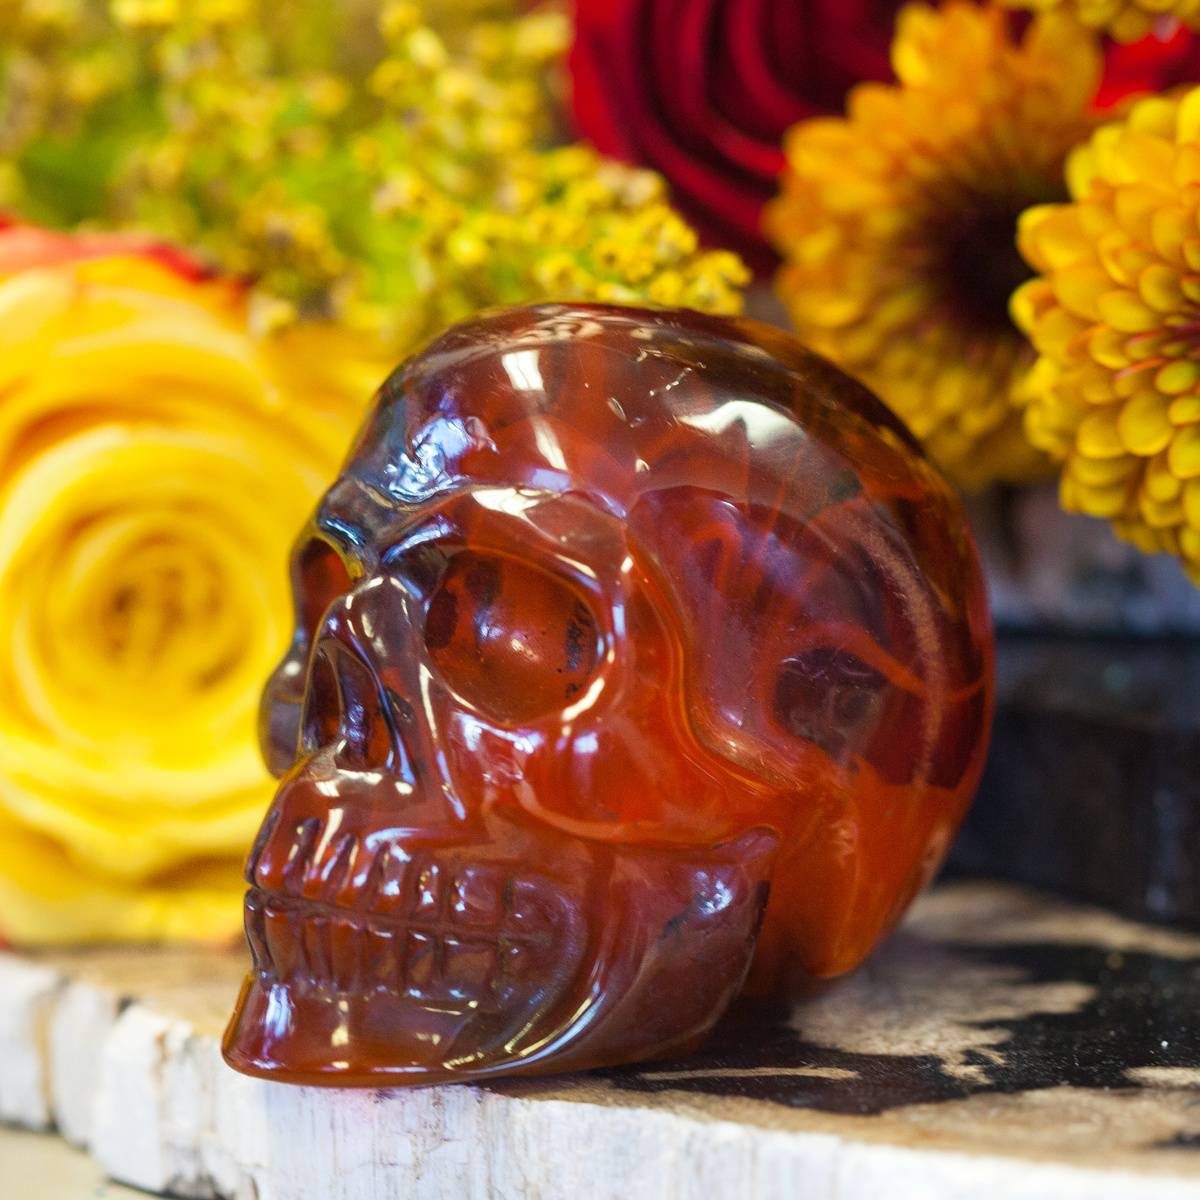 Samhain_Skulls_2of2_10_1